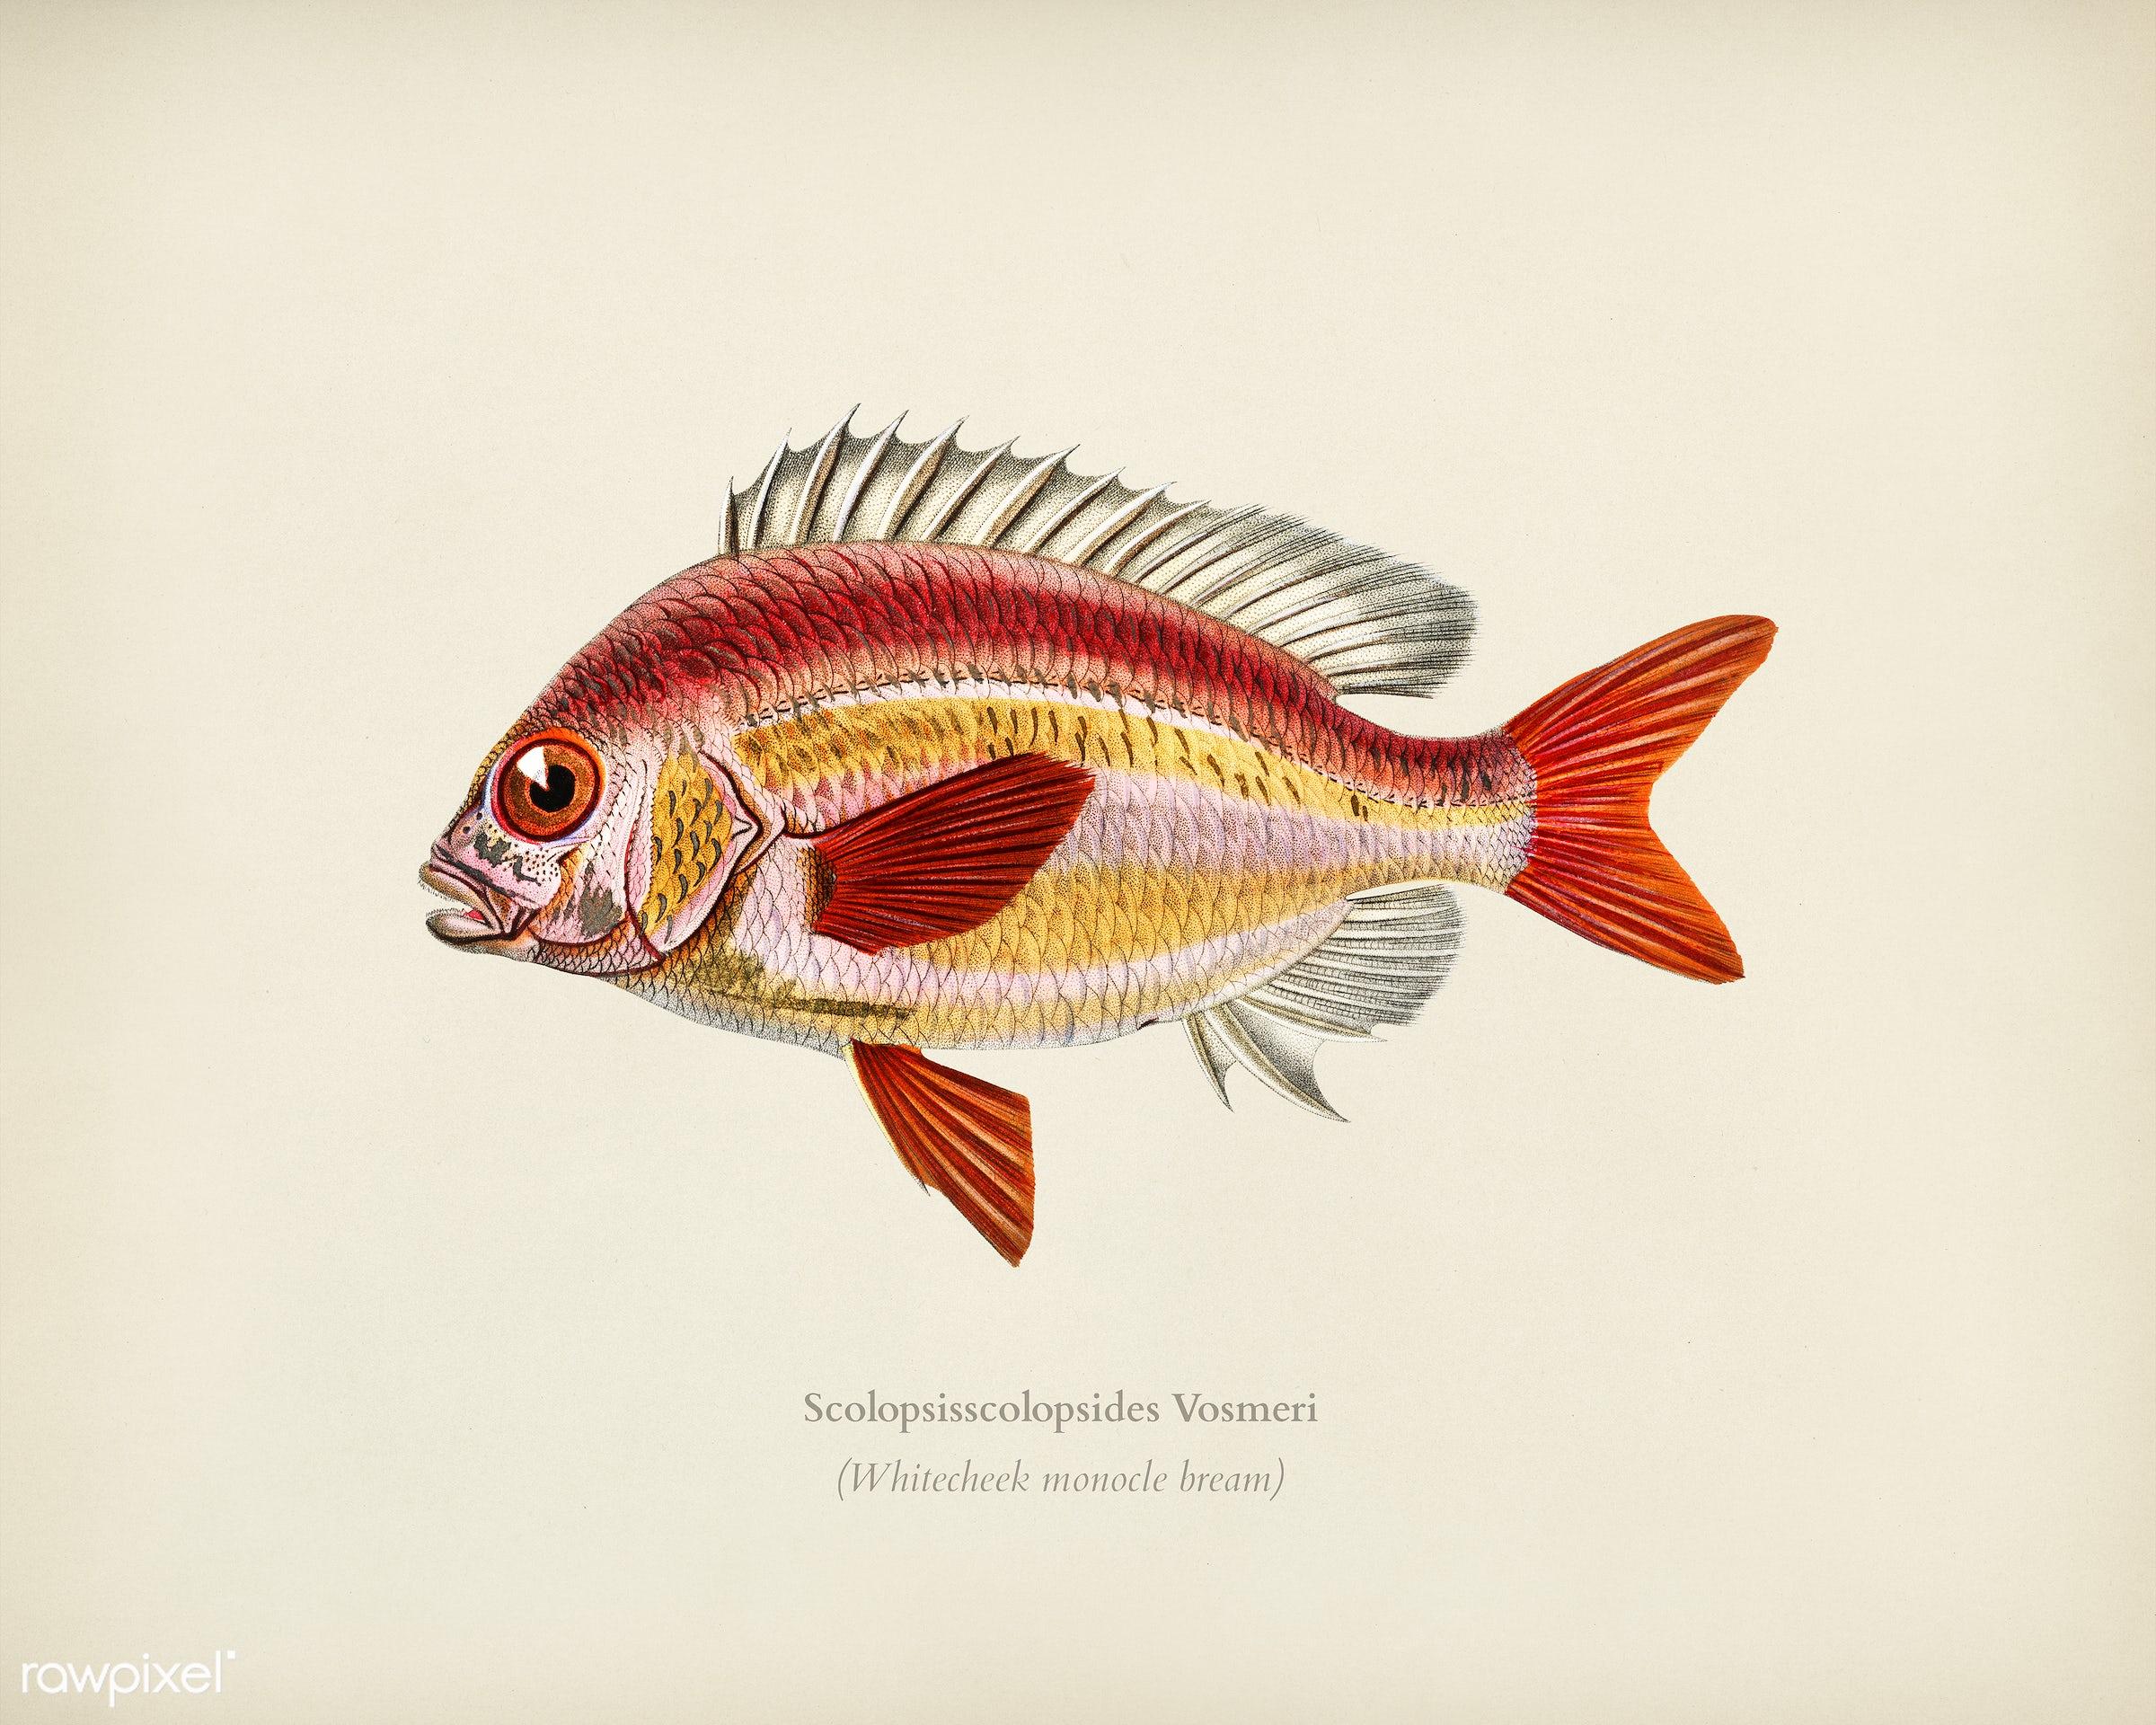 Whitecheek monocle bream (Scolopsisscolopsides Vosmeri) illustrated by Charles Dessalines D' Orbigny (1806-1876)....